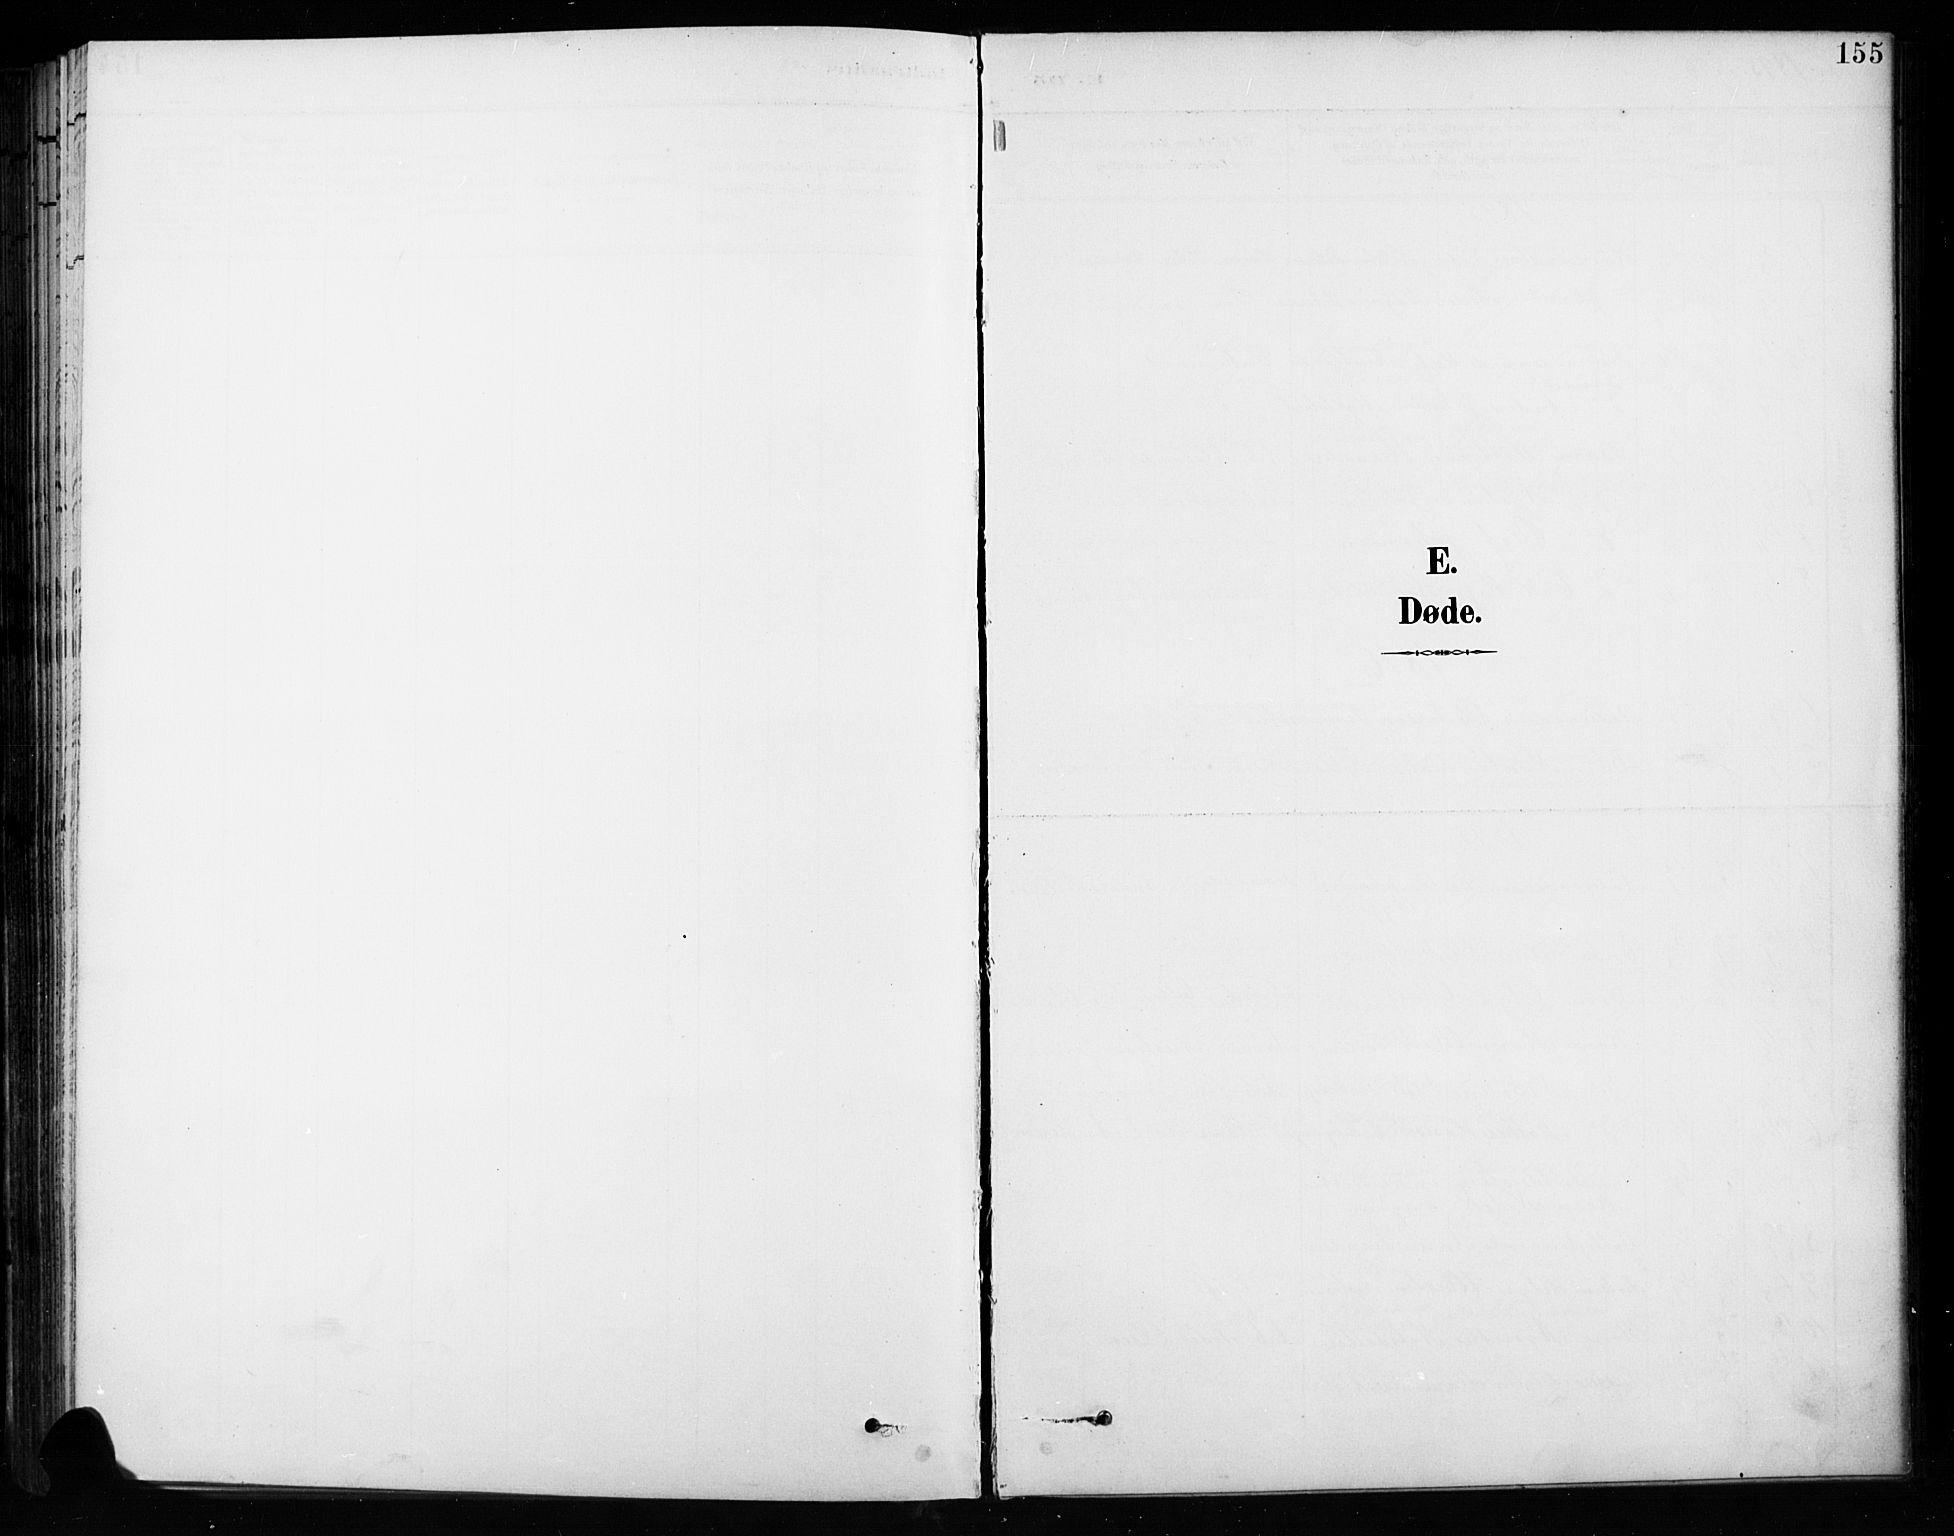 SAH, Vardal prestekontor, H/Ha/Hab/L0010: Klokkerbok nr. 10, 1895-1903, s. 155